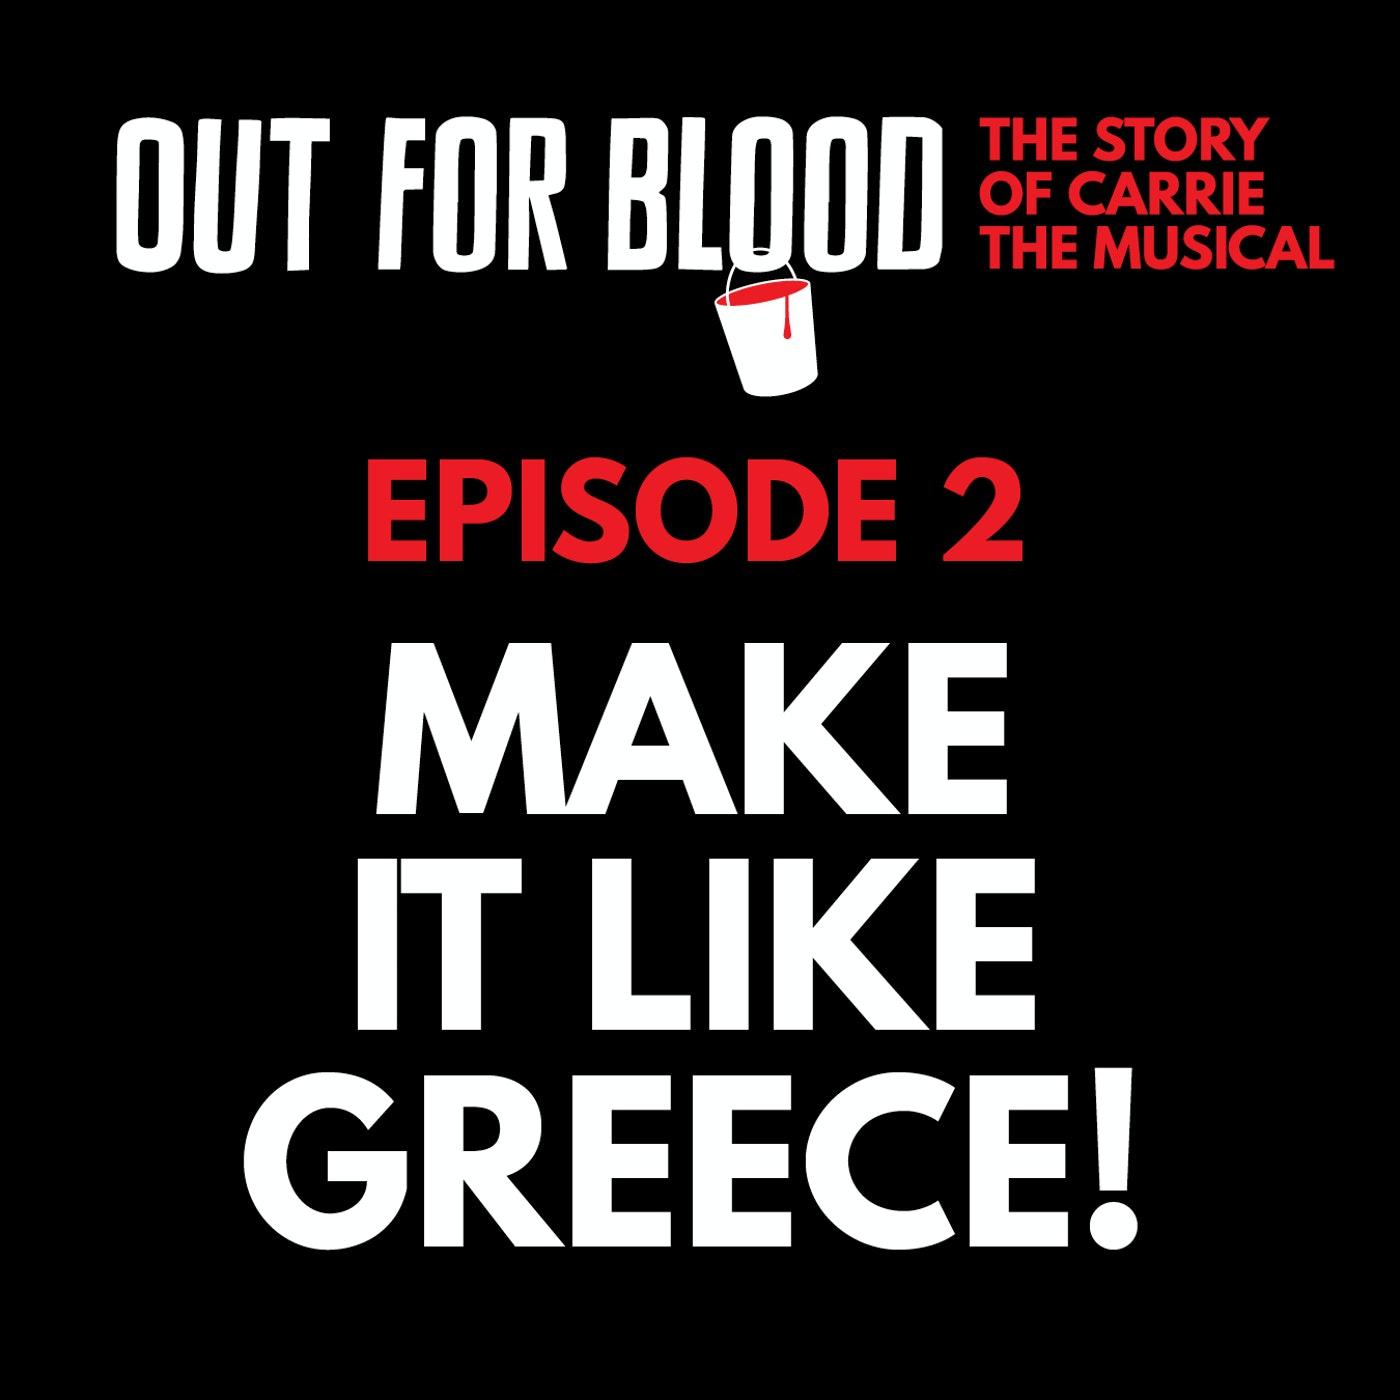 Chapter 2: Make it like Greece!